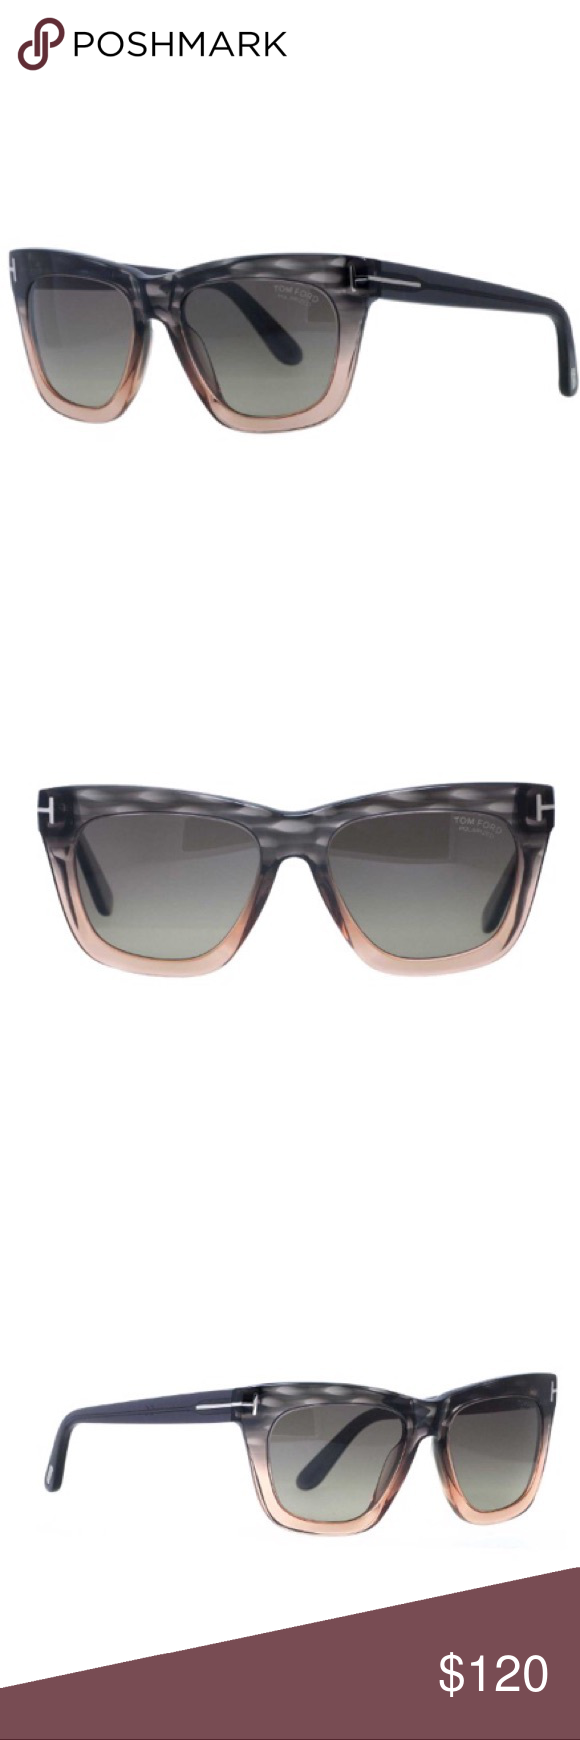 280faafe4ee Tom Ford Celina TF361 Women s Sunglasses NEW Sunglasses Tom Ford CELINA TF  361 FT 20D grey